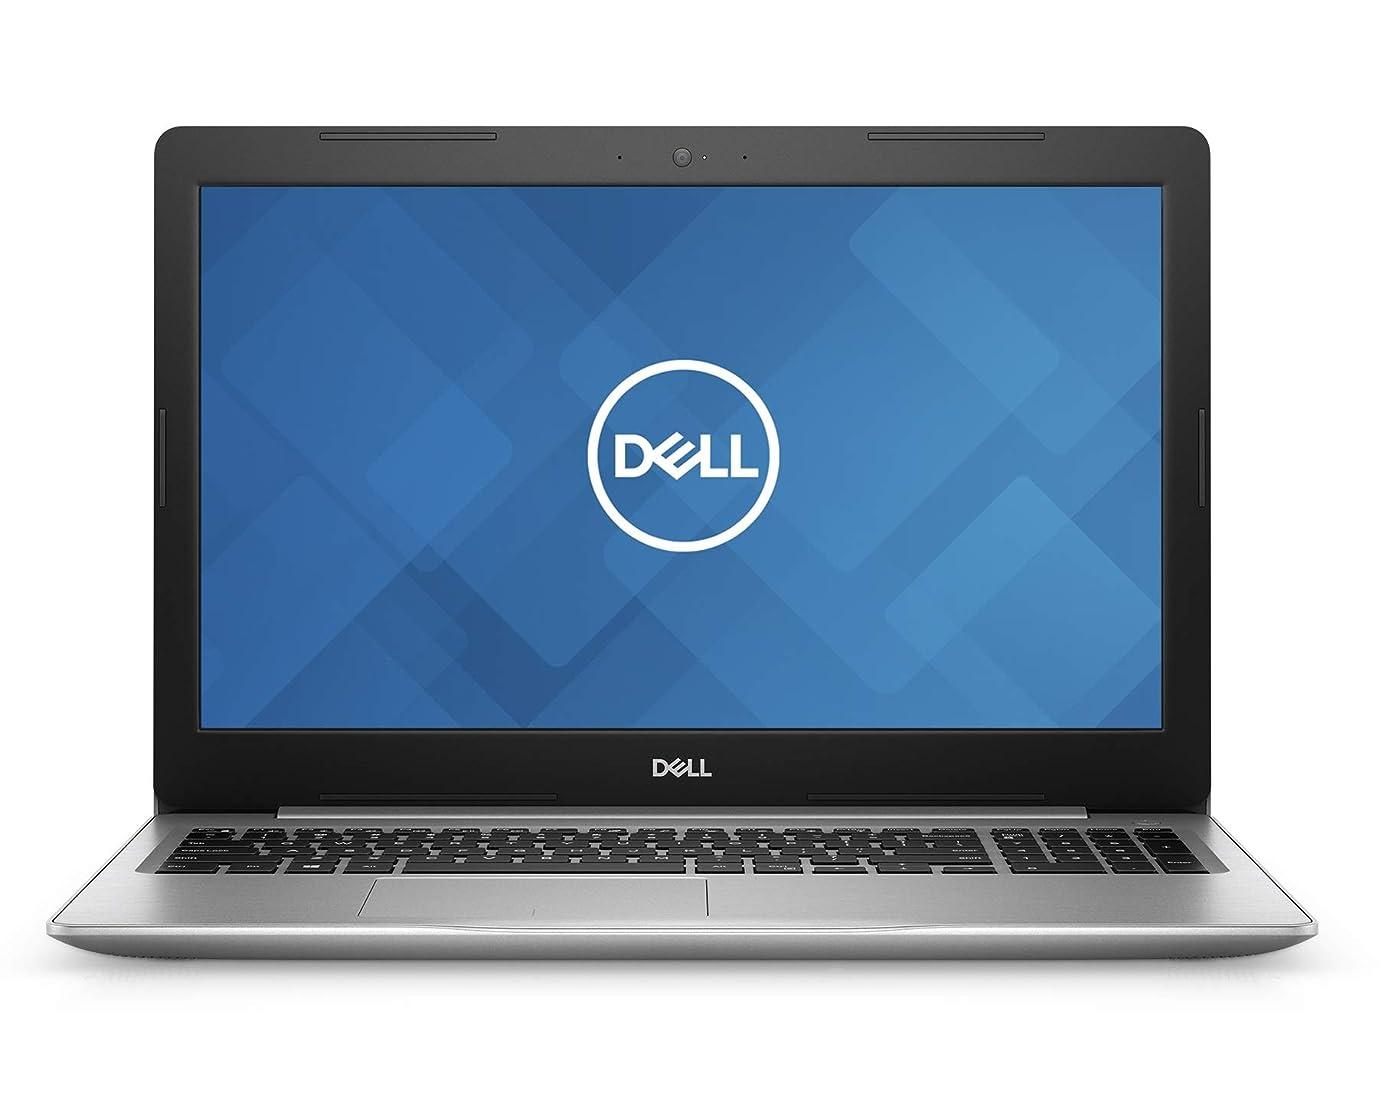 Dell Inspiron 15-5570 Home and Business Laptop (Intel i7-7500U 2-Core, 8GB RAM, 2TB SATA SSD, 15.6